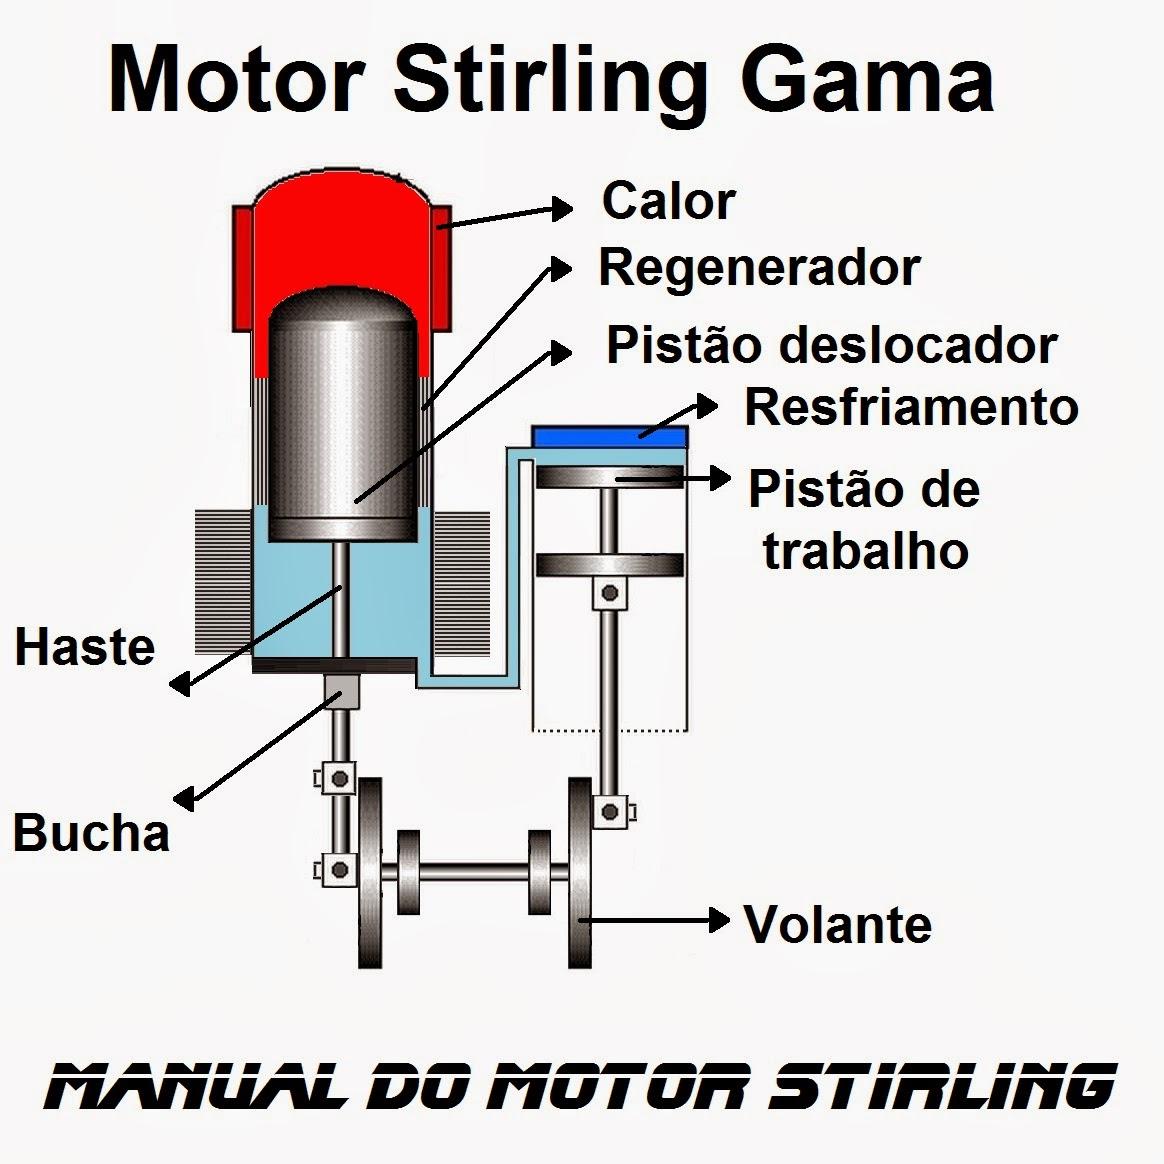 Manual do motor Stilring, Motor Stirling Gama